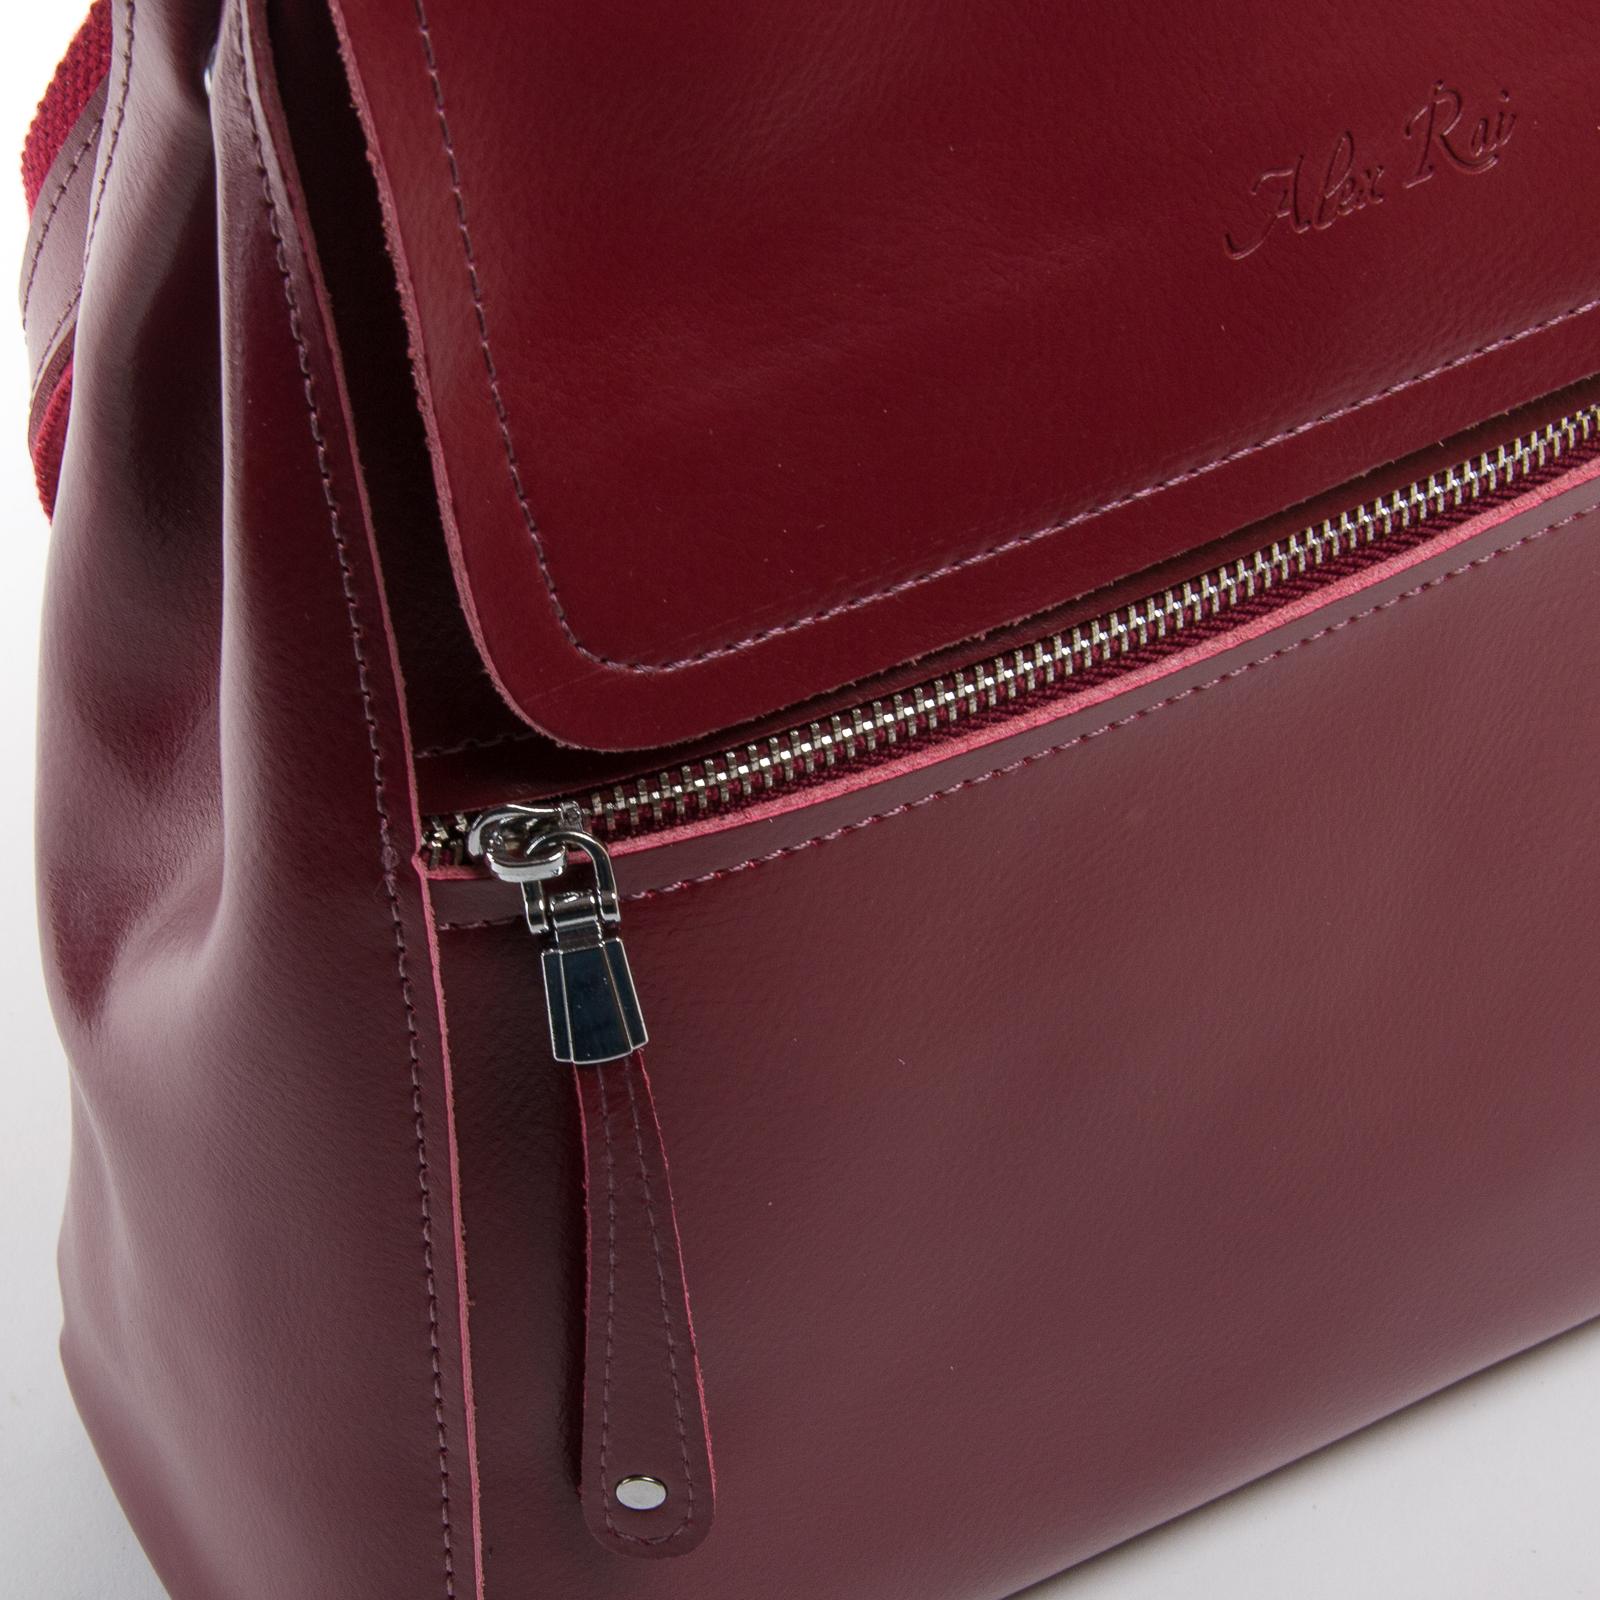 Сумка Женская Рюкзак кожа ALEX RAI 03-01 1005 light-red - фото 3